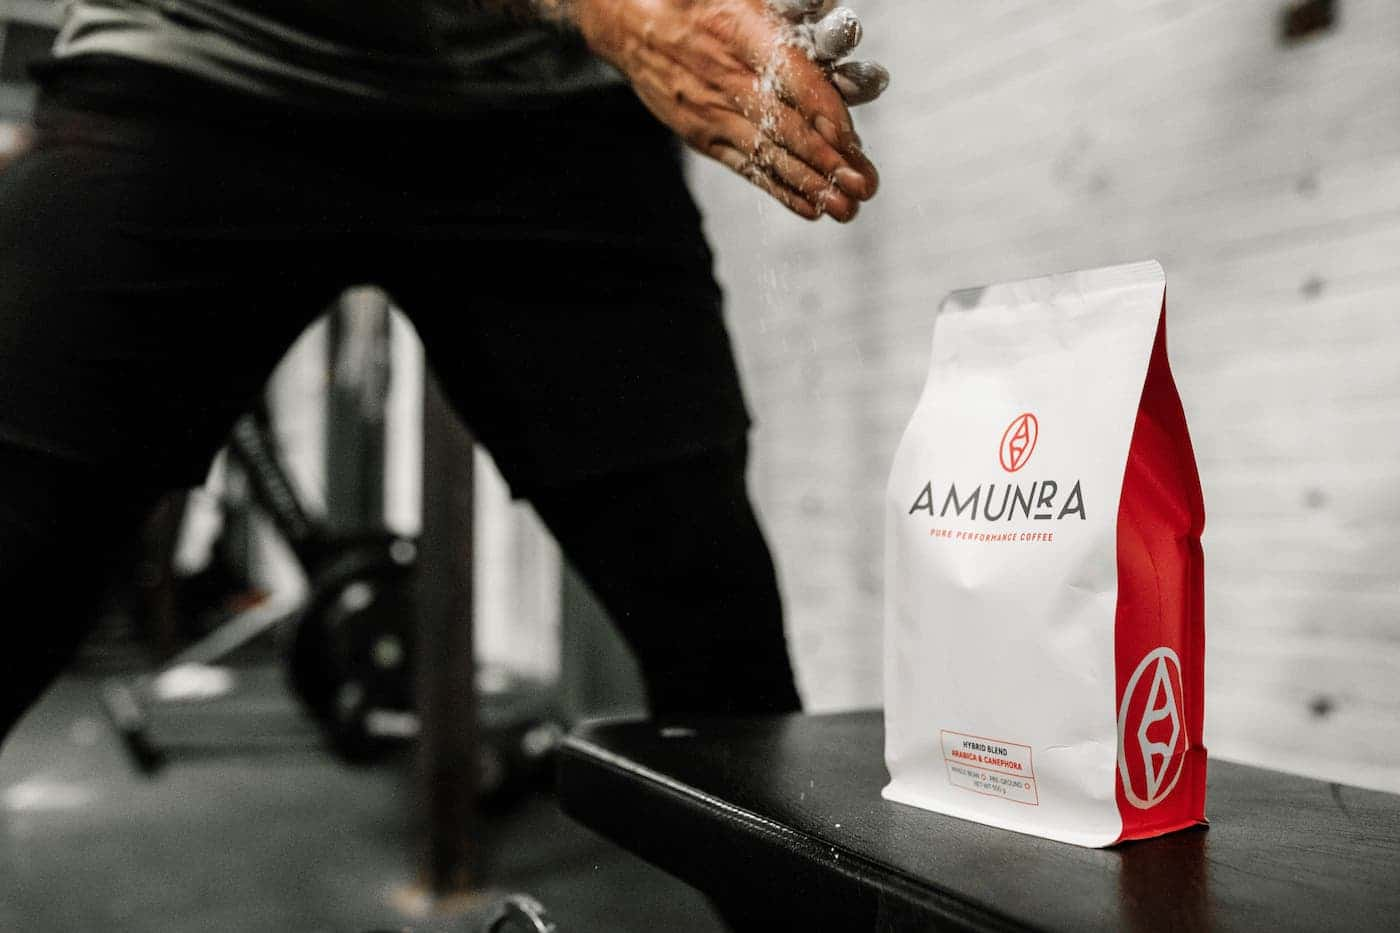 amunra coffee 1